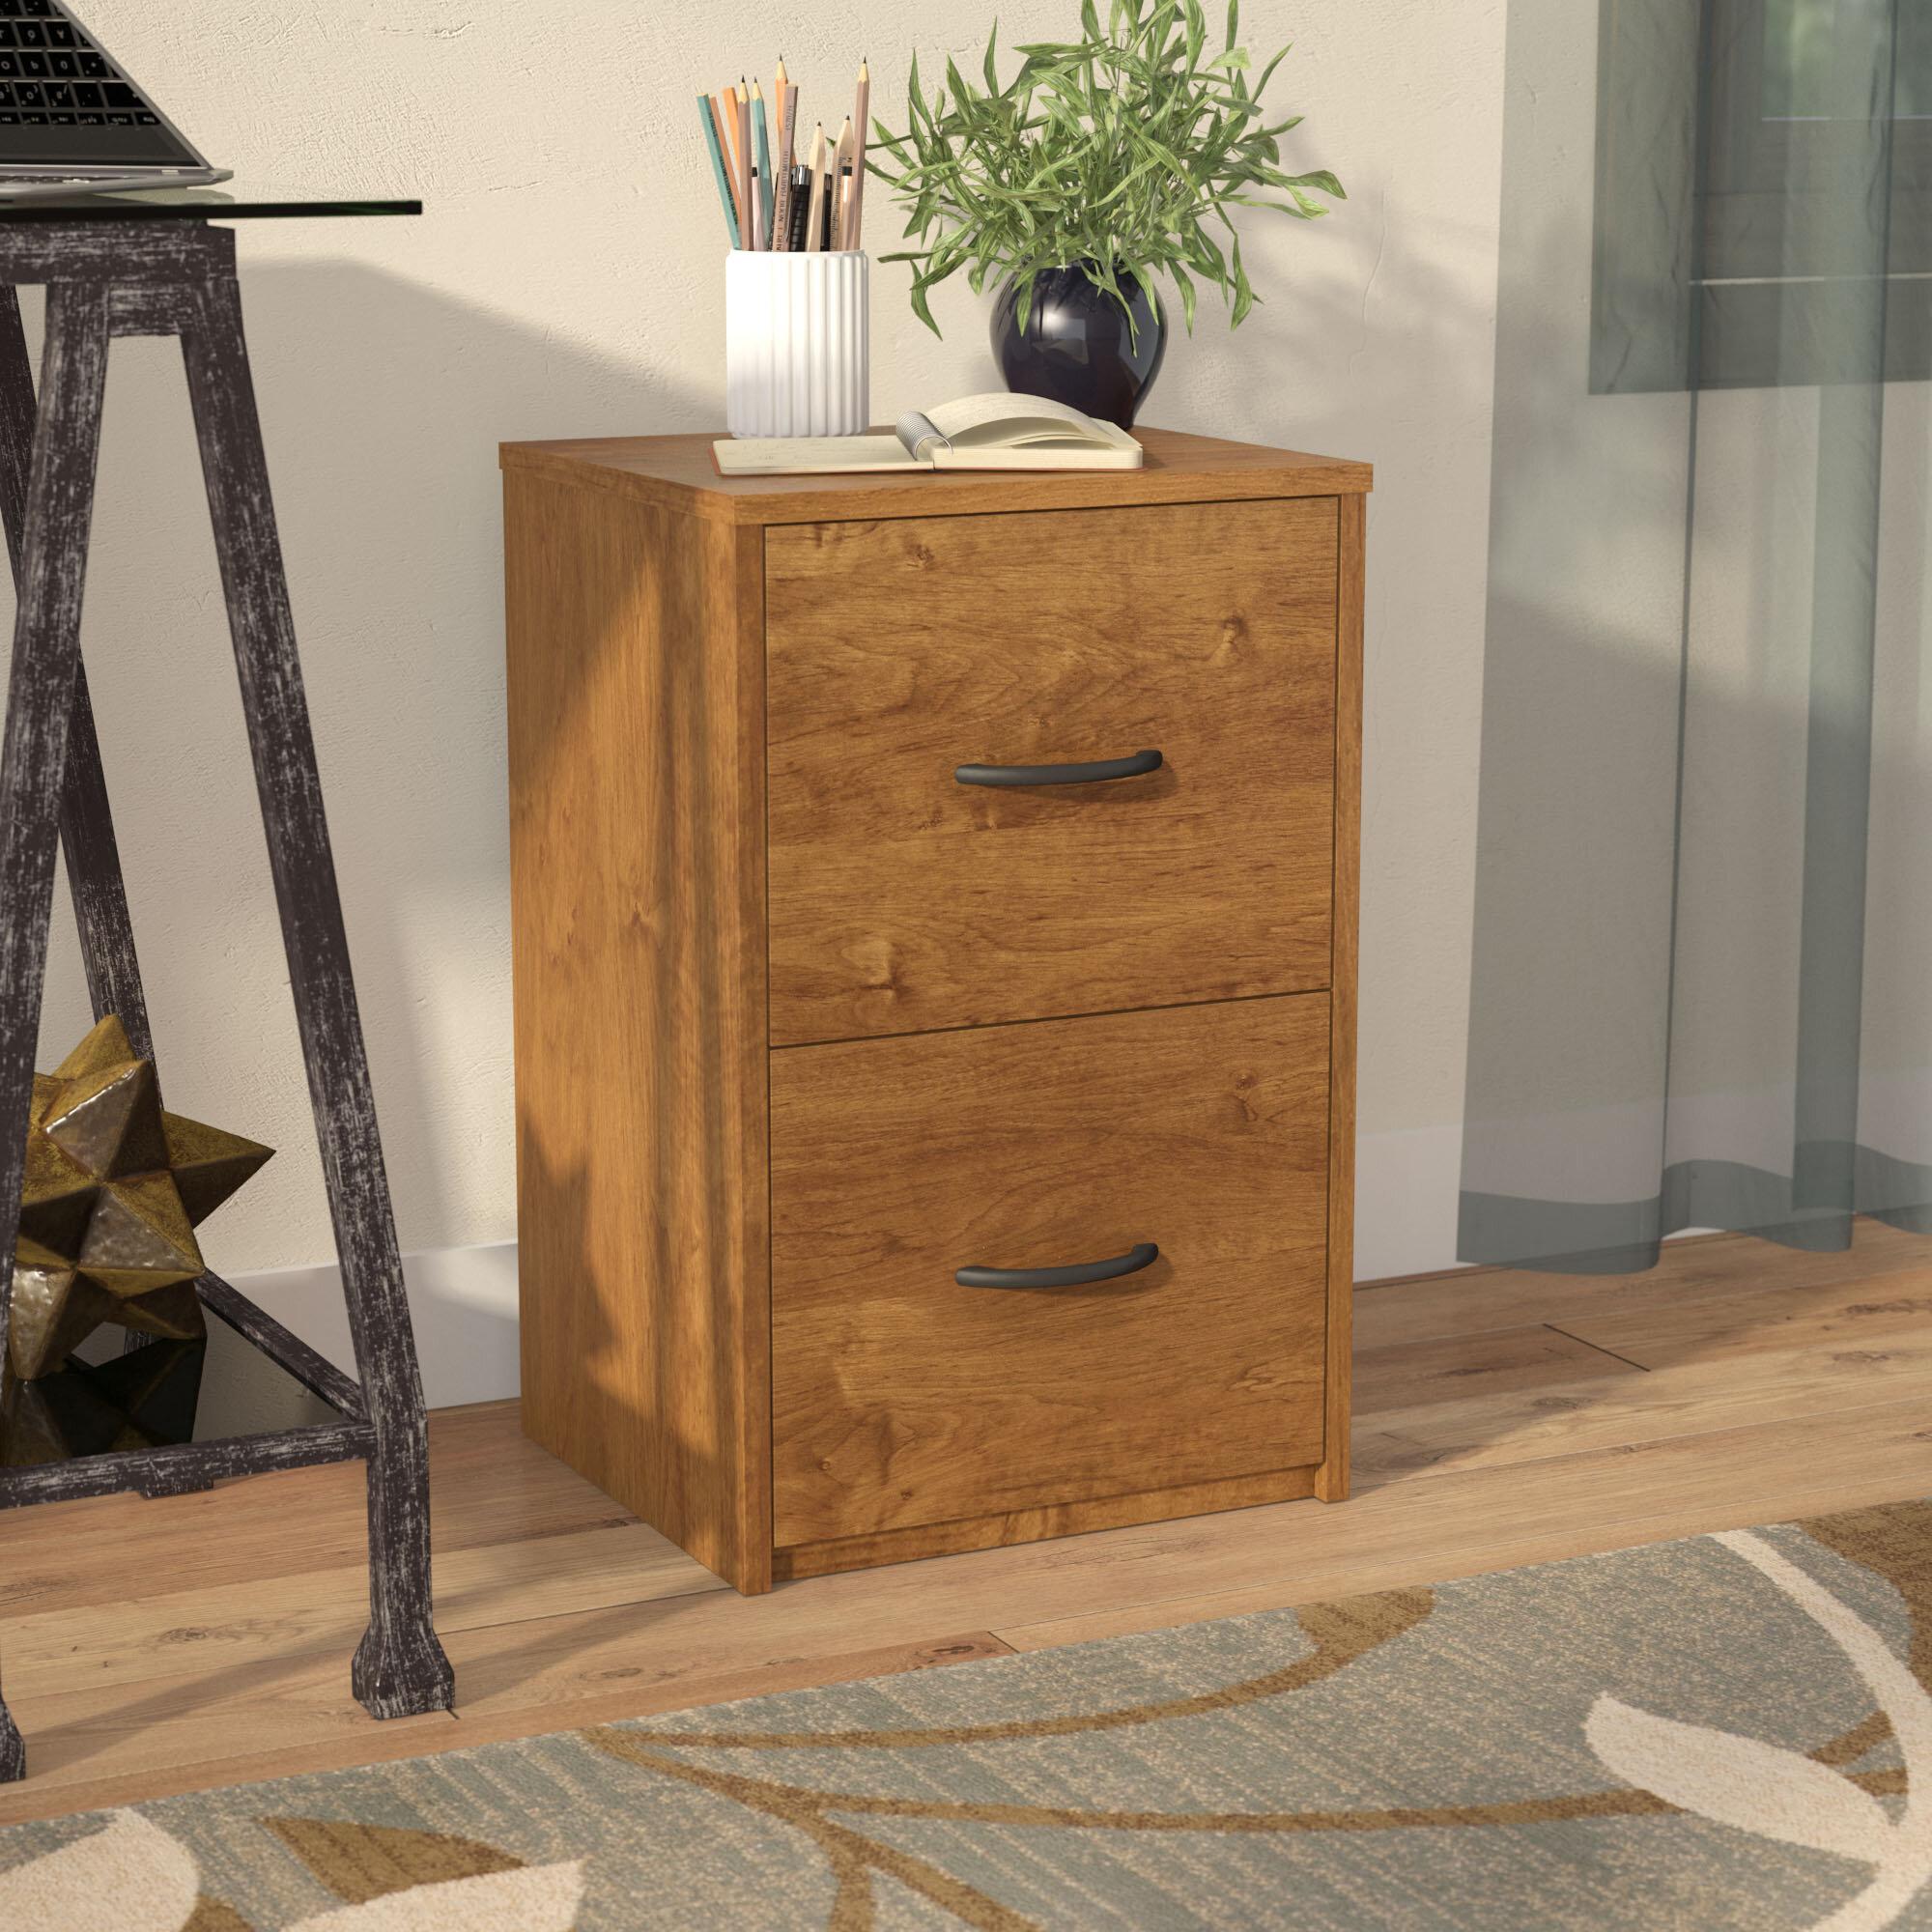 Symple Stuff 2 Drawer File Cabinet Reviews Wayfair